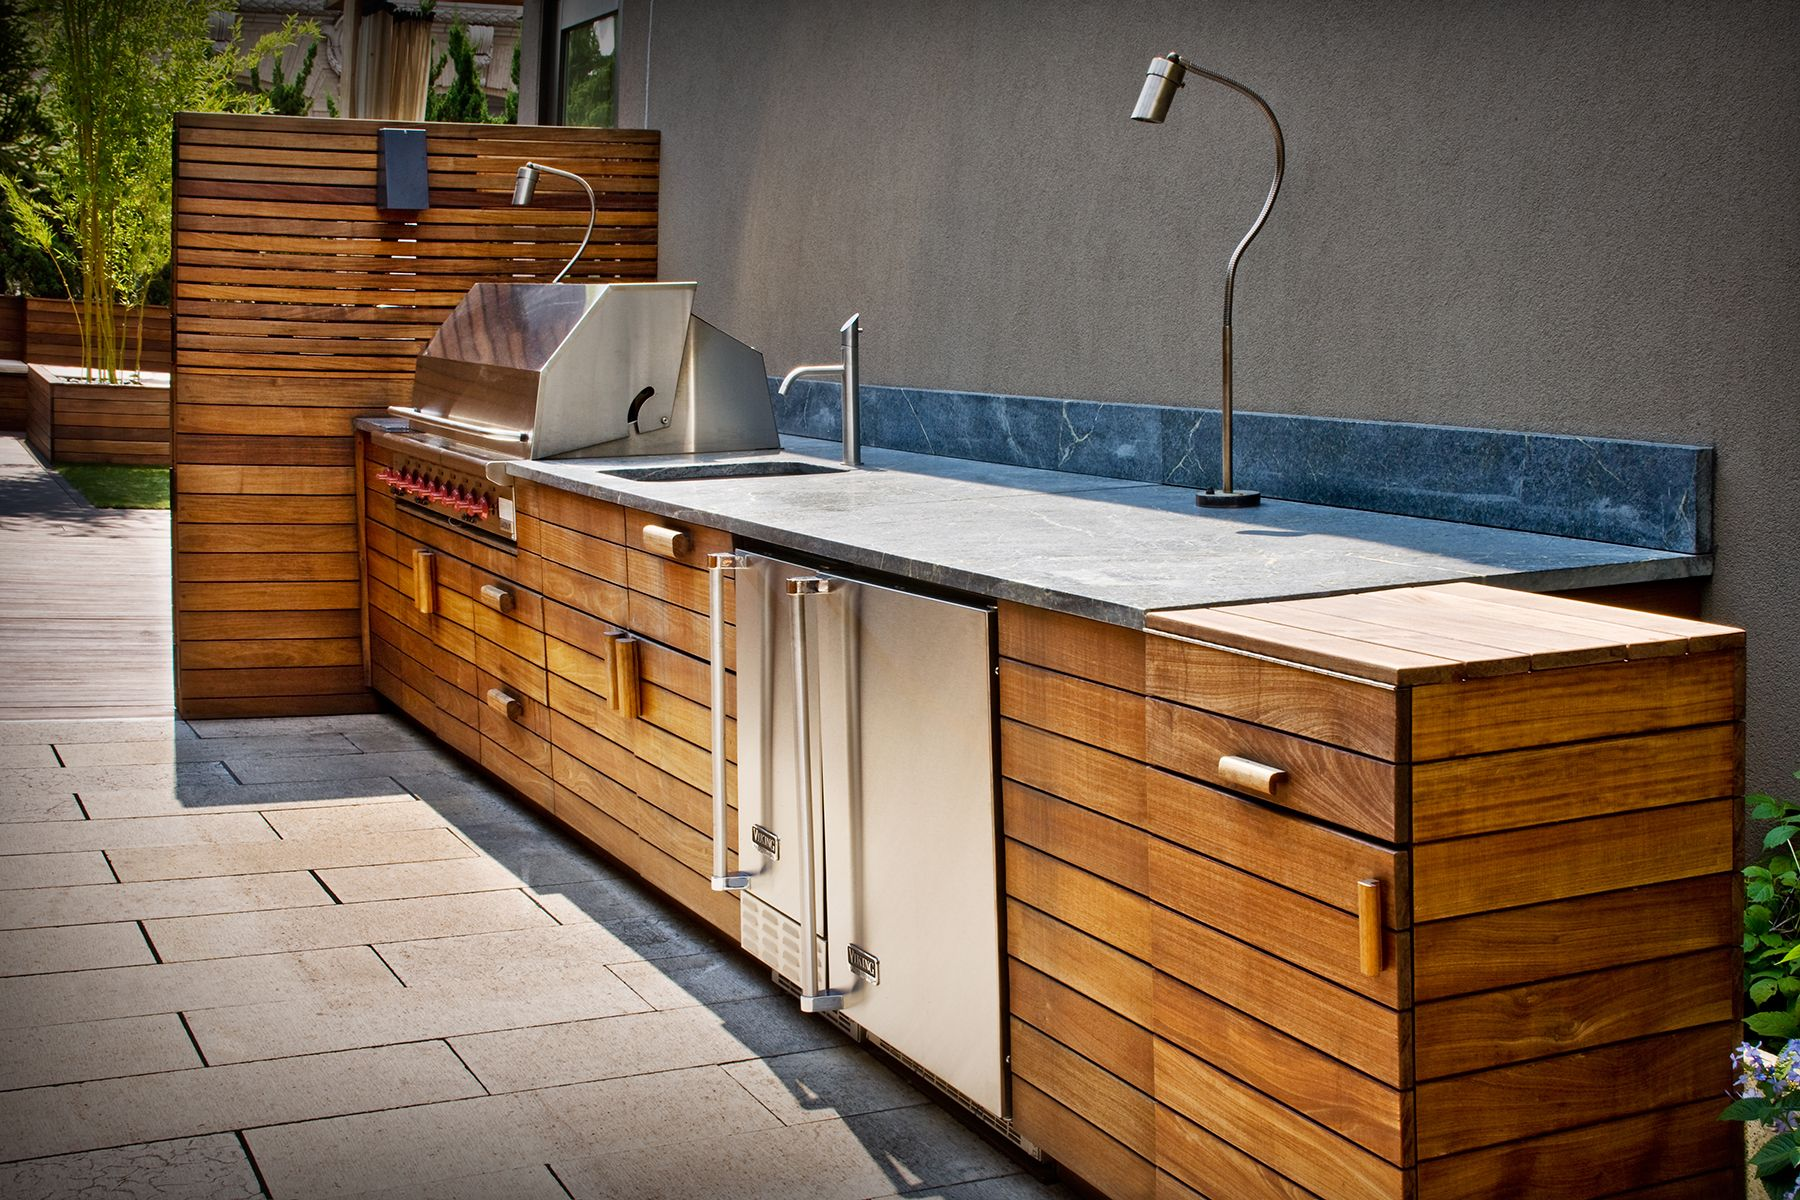 Crosby Street Rooftop Gunn Landscape Architecture Pllc Gunn Landscape Architecture Pllc Outd Modern Outdoor Kitchen Outdoor Kitchen Design Outdoor Kitchen